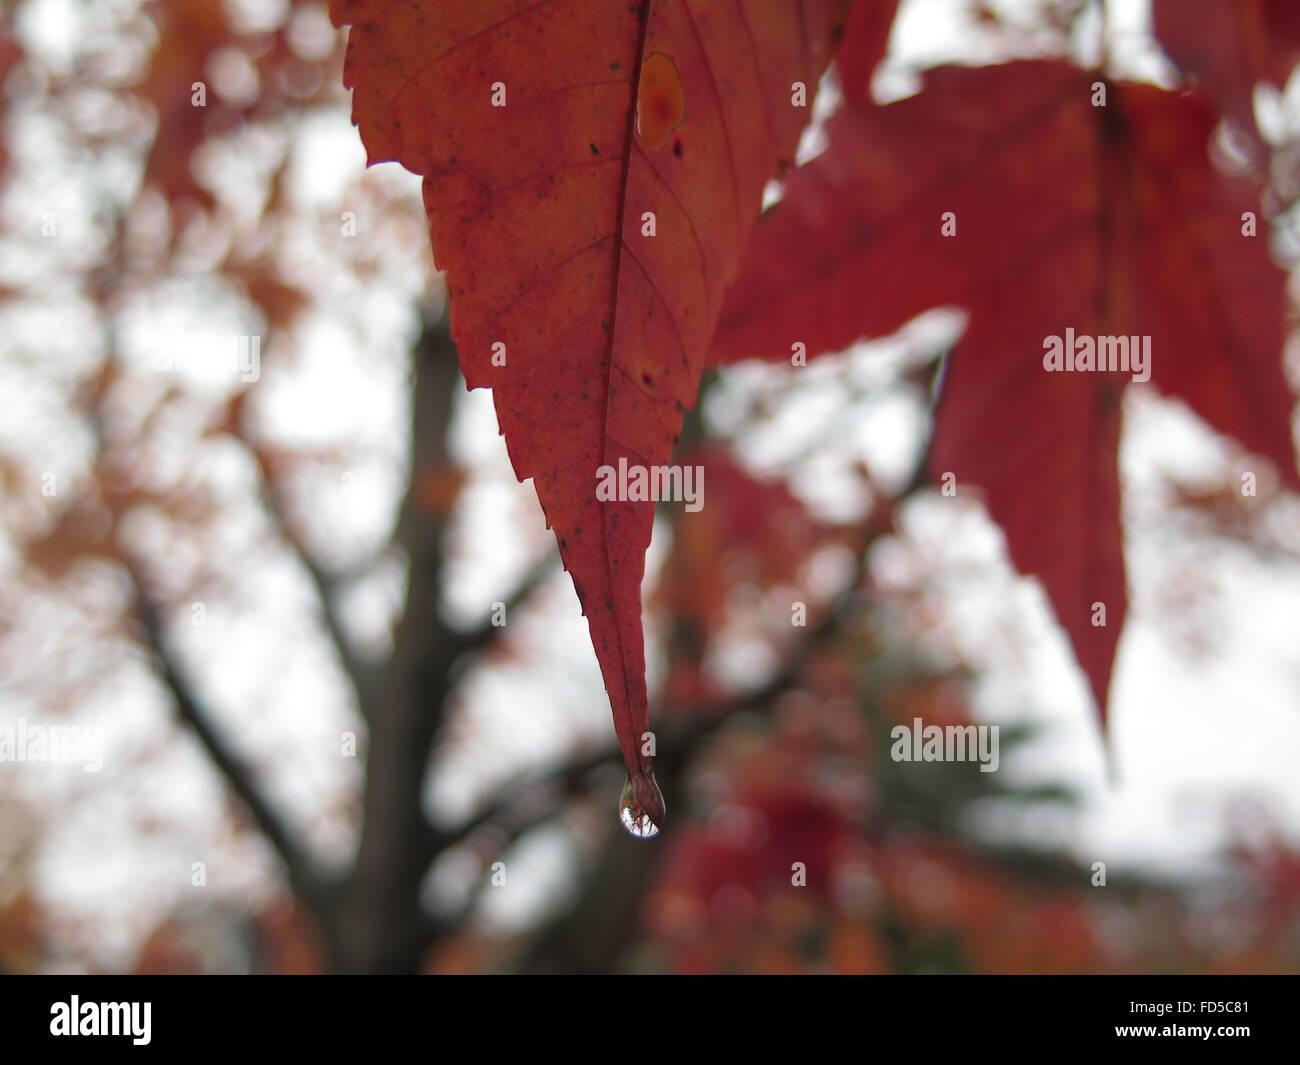 Waterdrop on Orange Coloured Leaf - Stock Image